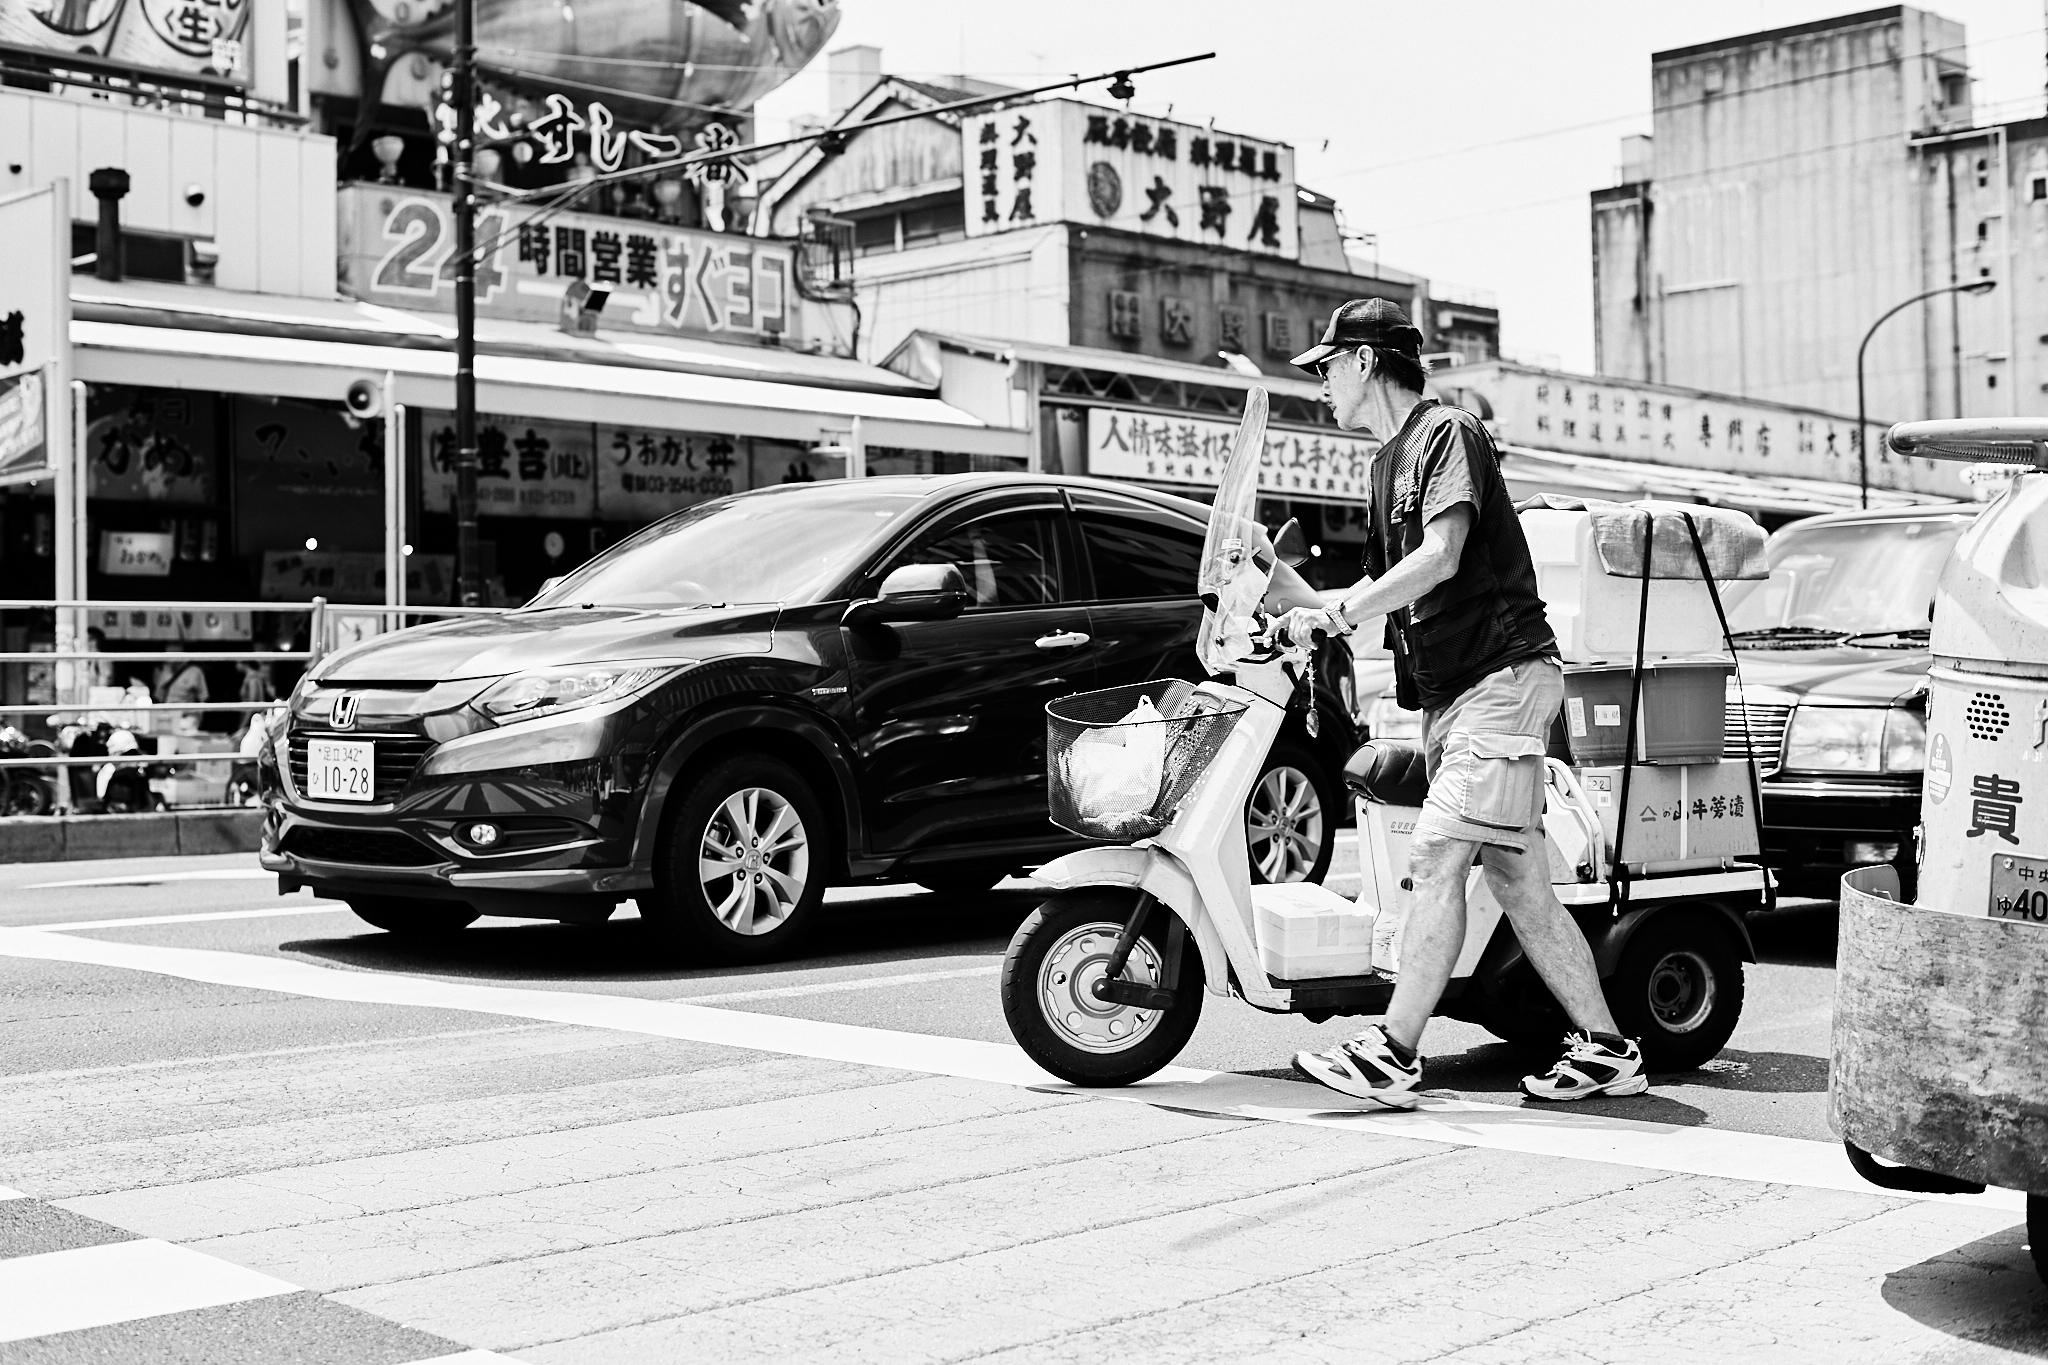 SnapPilots_17-07-05_Tokyo2017_bnw_49.jpg